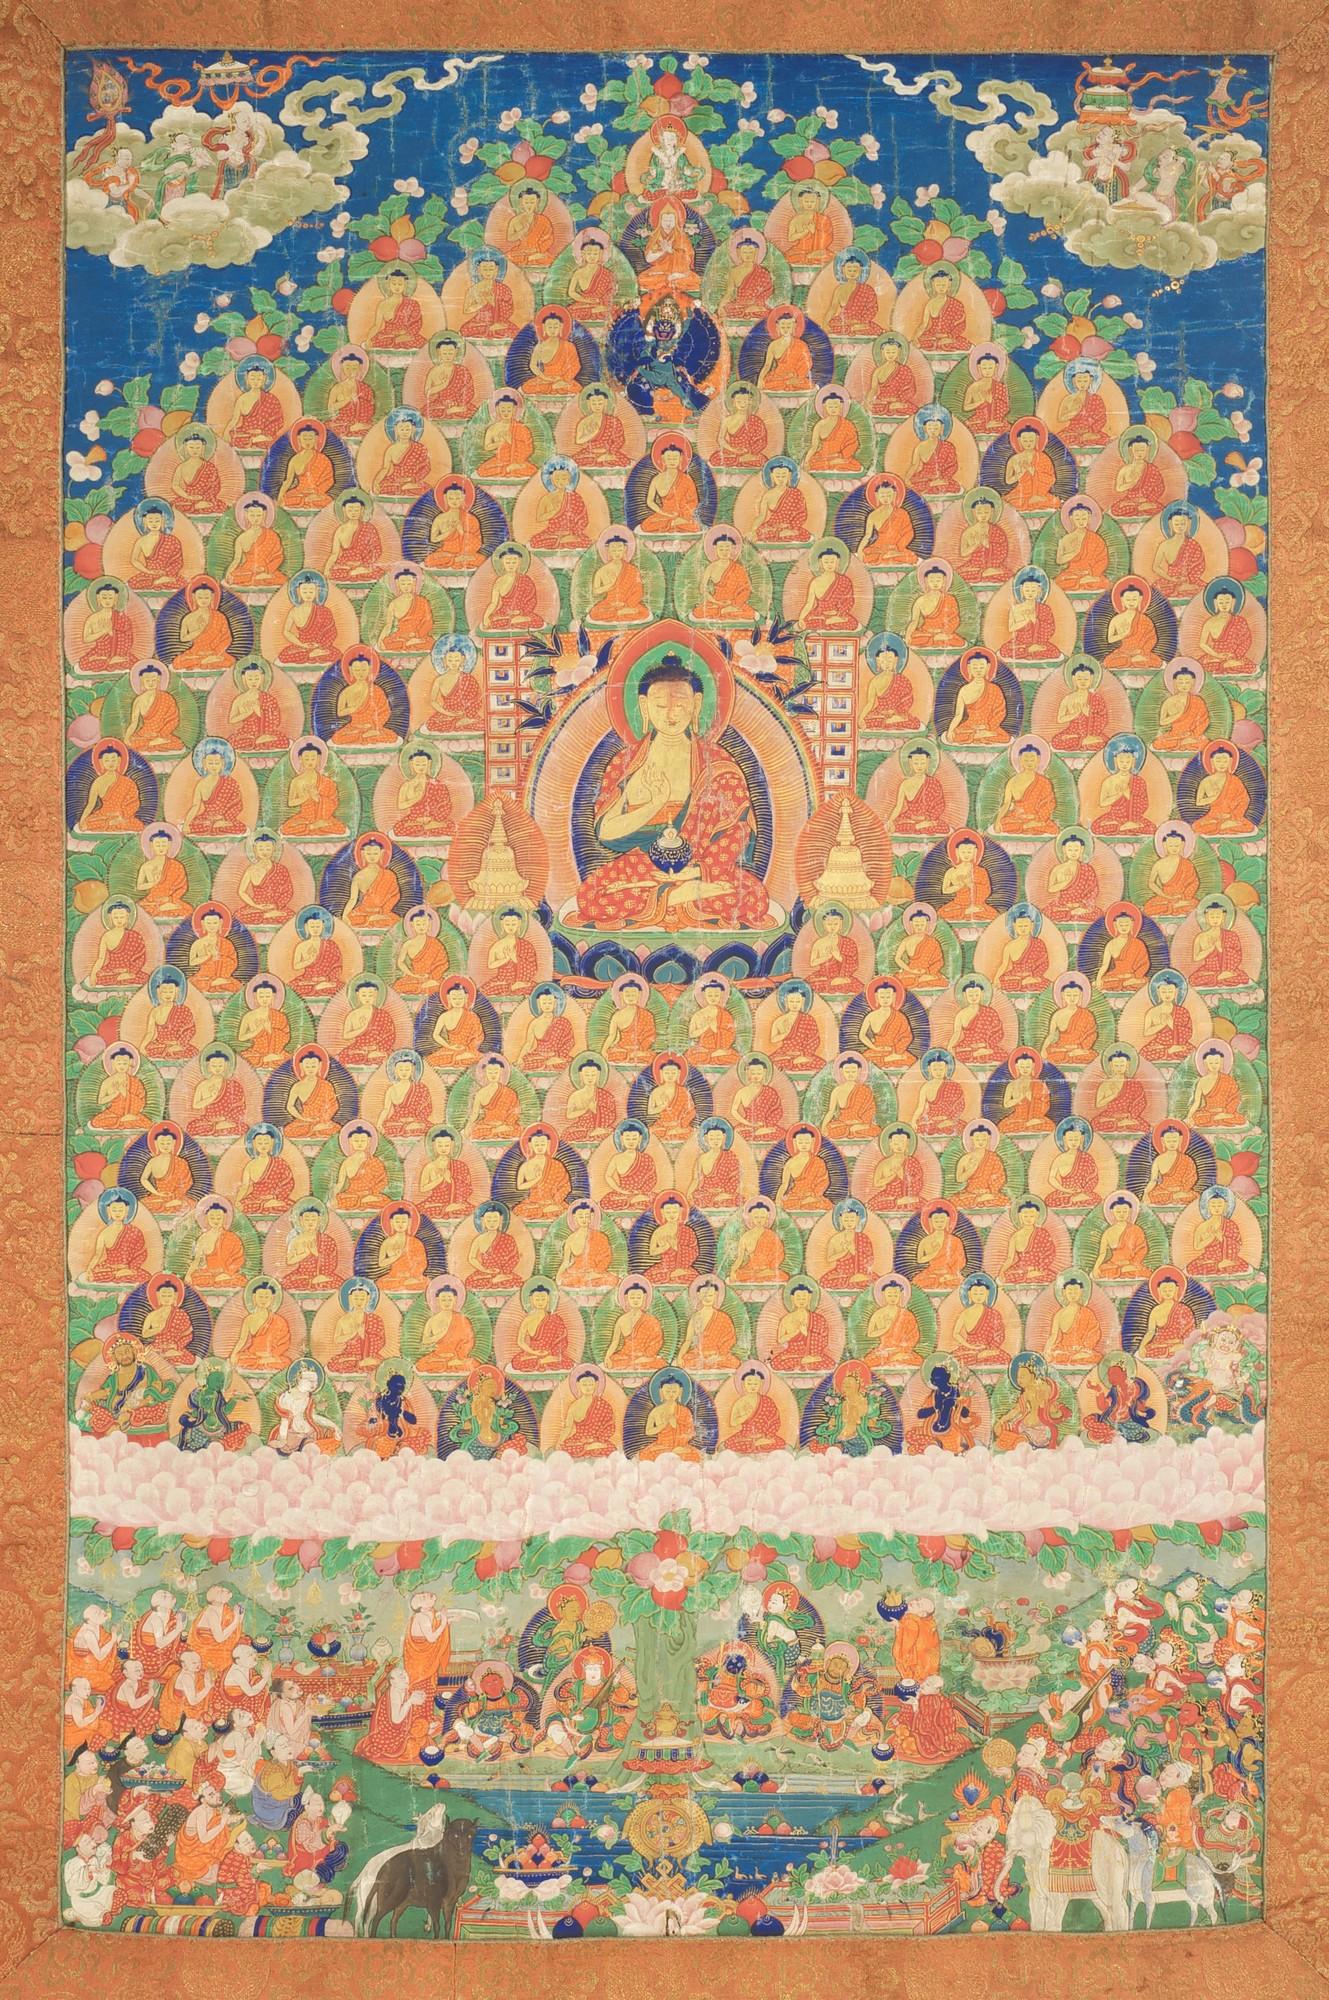 Buddhist Inner Sciences 101: Three Luminosities - Ep. 55 of the Bob Thurman Podcast by Robert A.F. Thurman